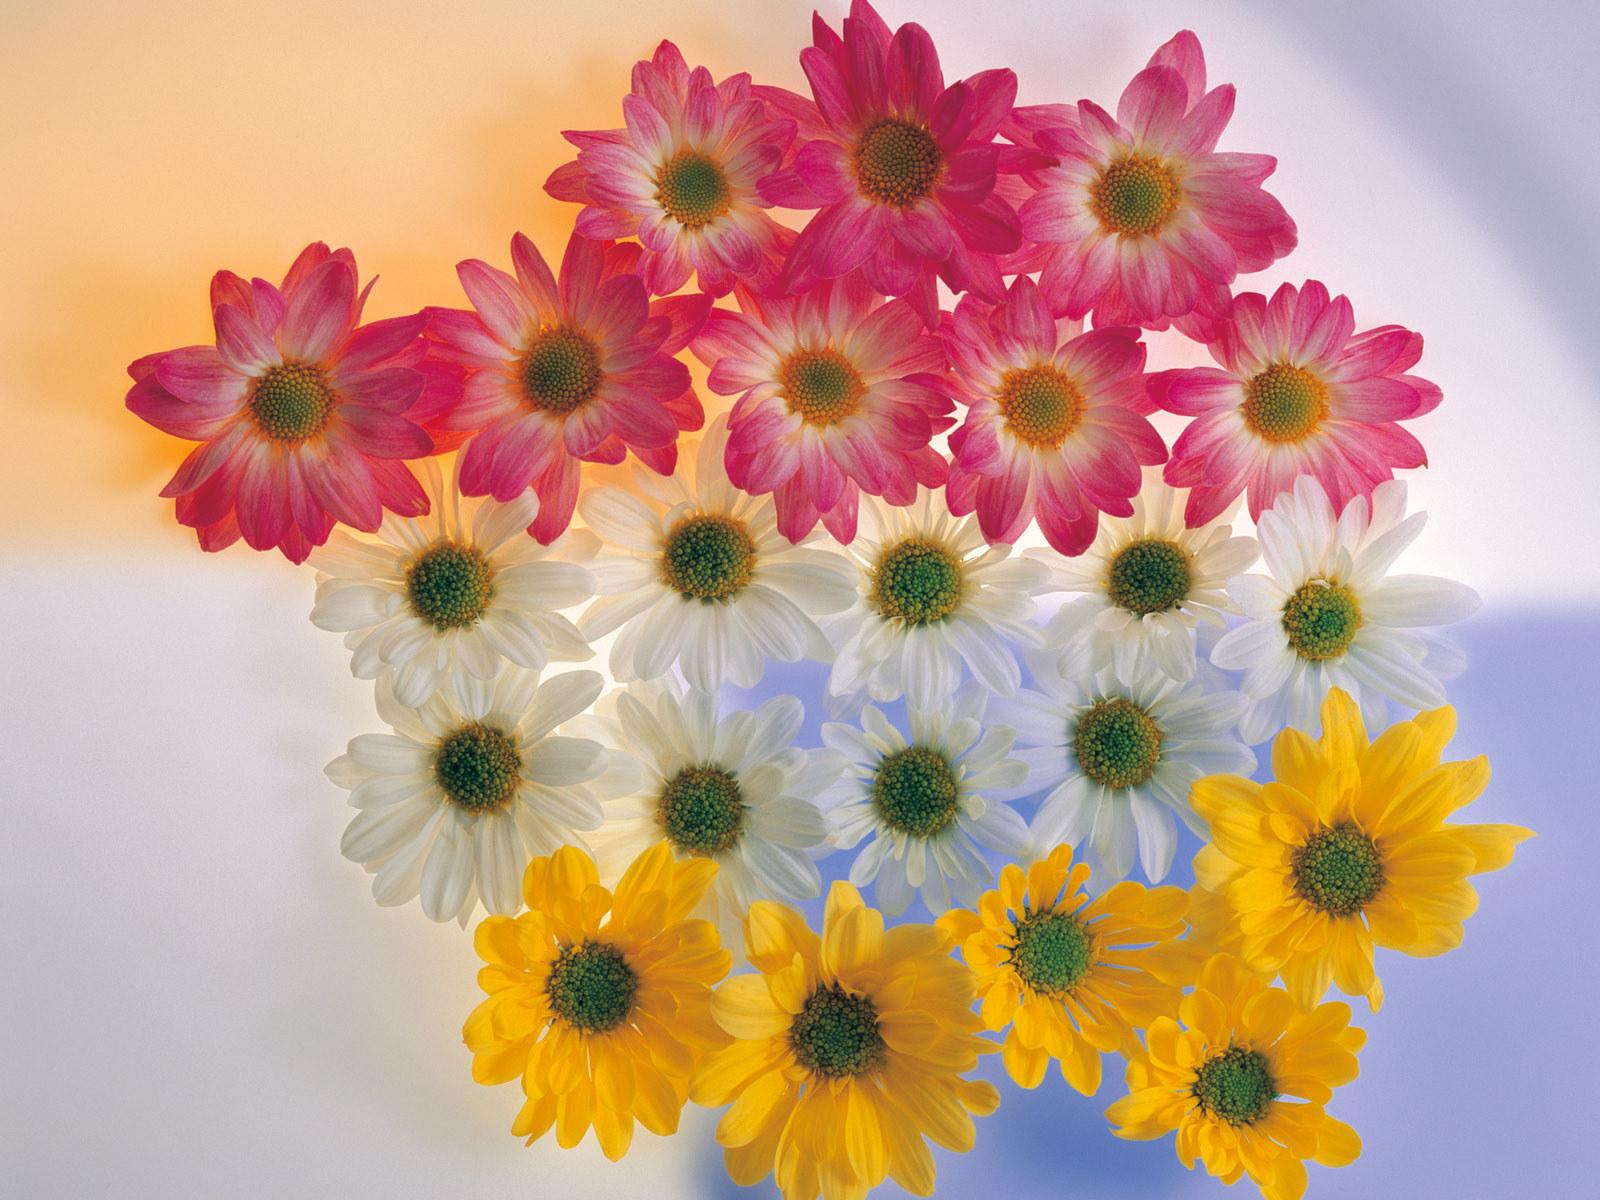 Nice Pictures Of Flowers Wallpapers Wallpapersafari